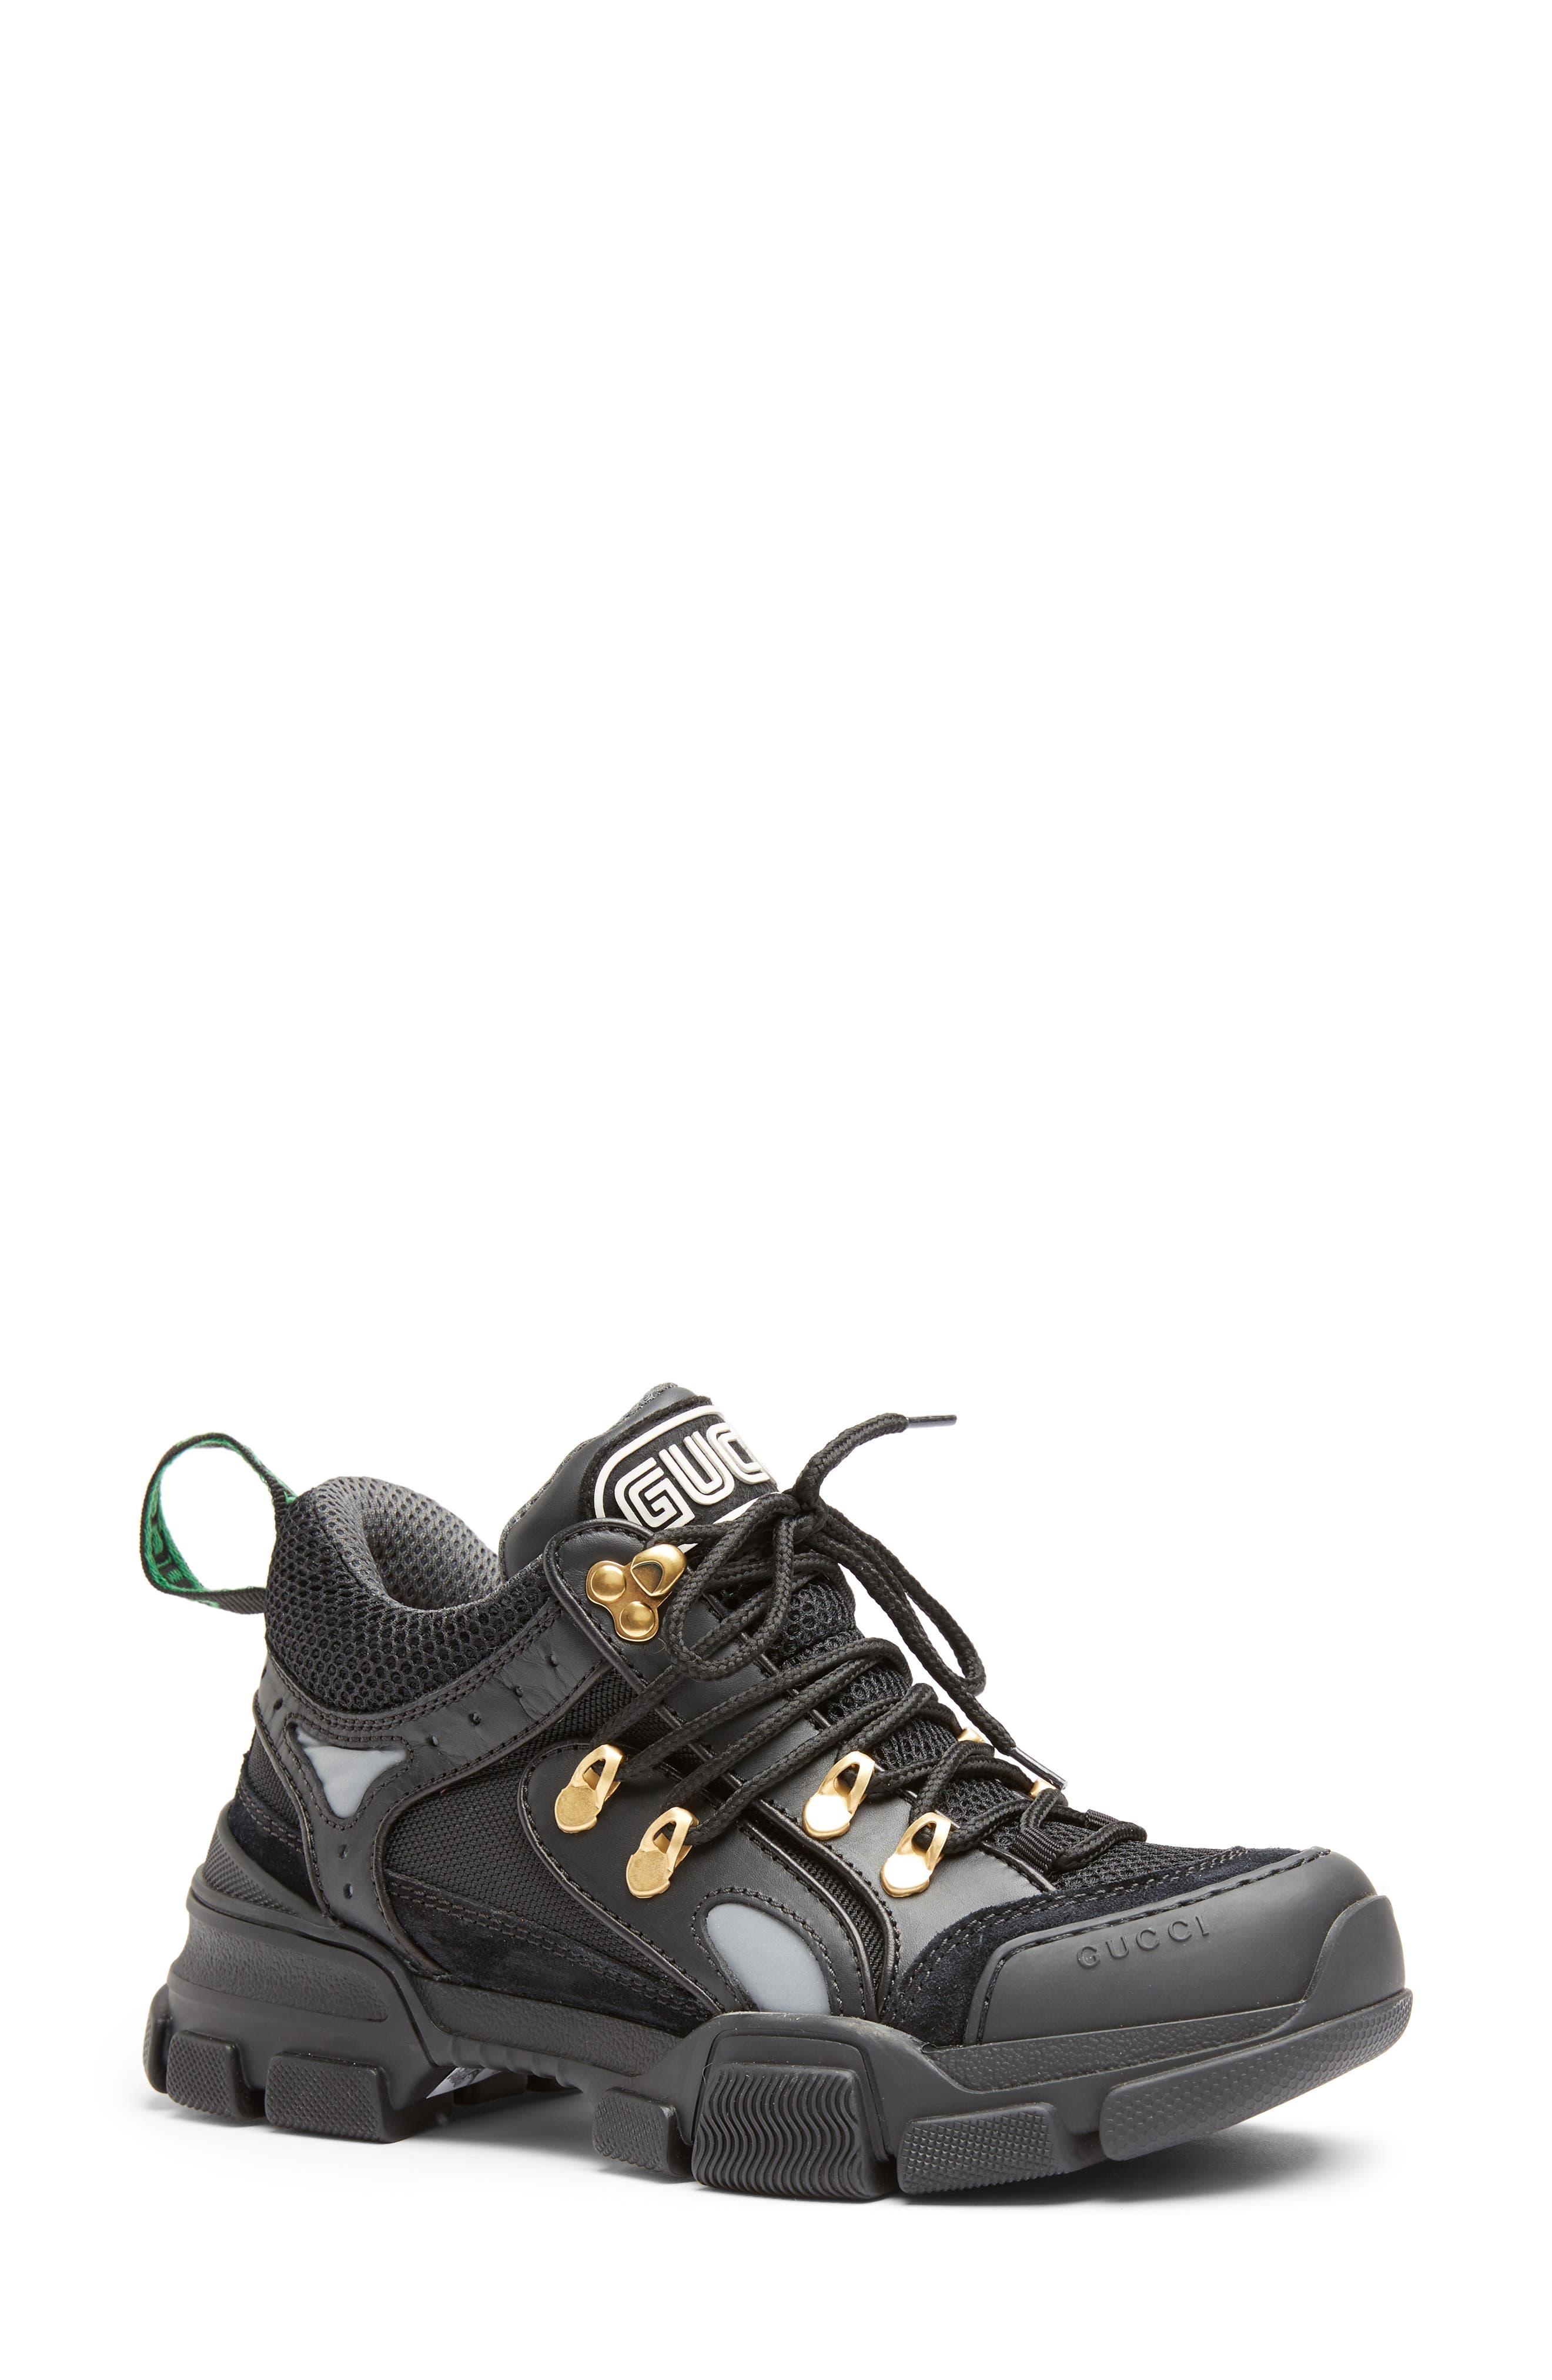 Gucci Flashtrek Sneaker, Black